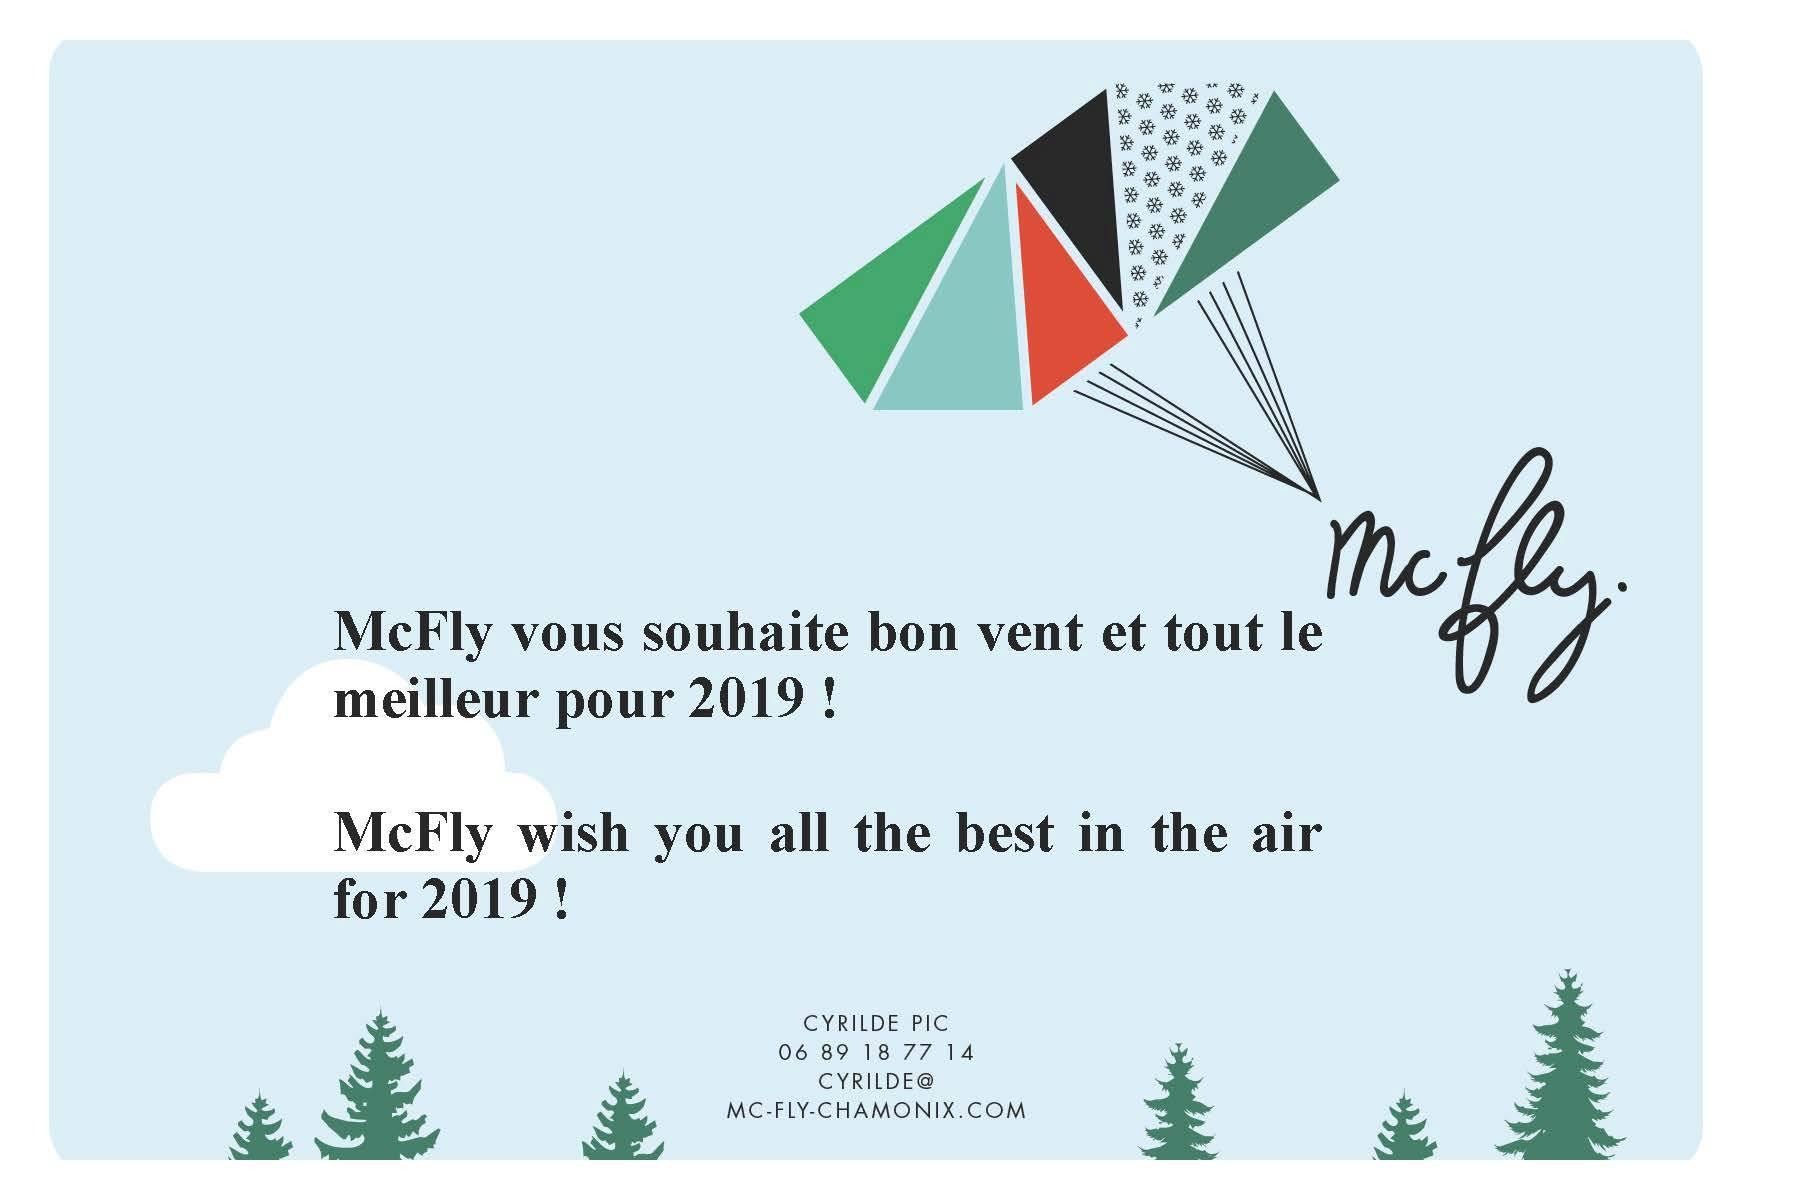 Voeux 2019 Mc Fly Chamonix Biplace parapente Speedriding